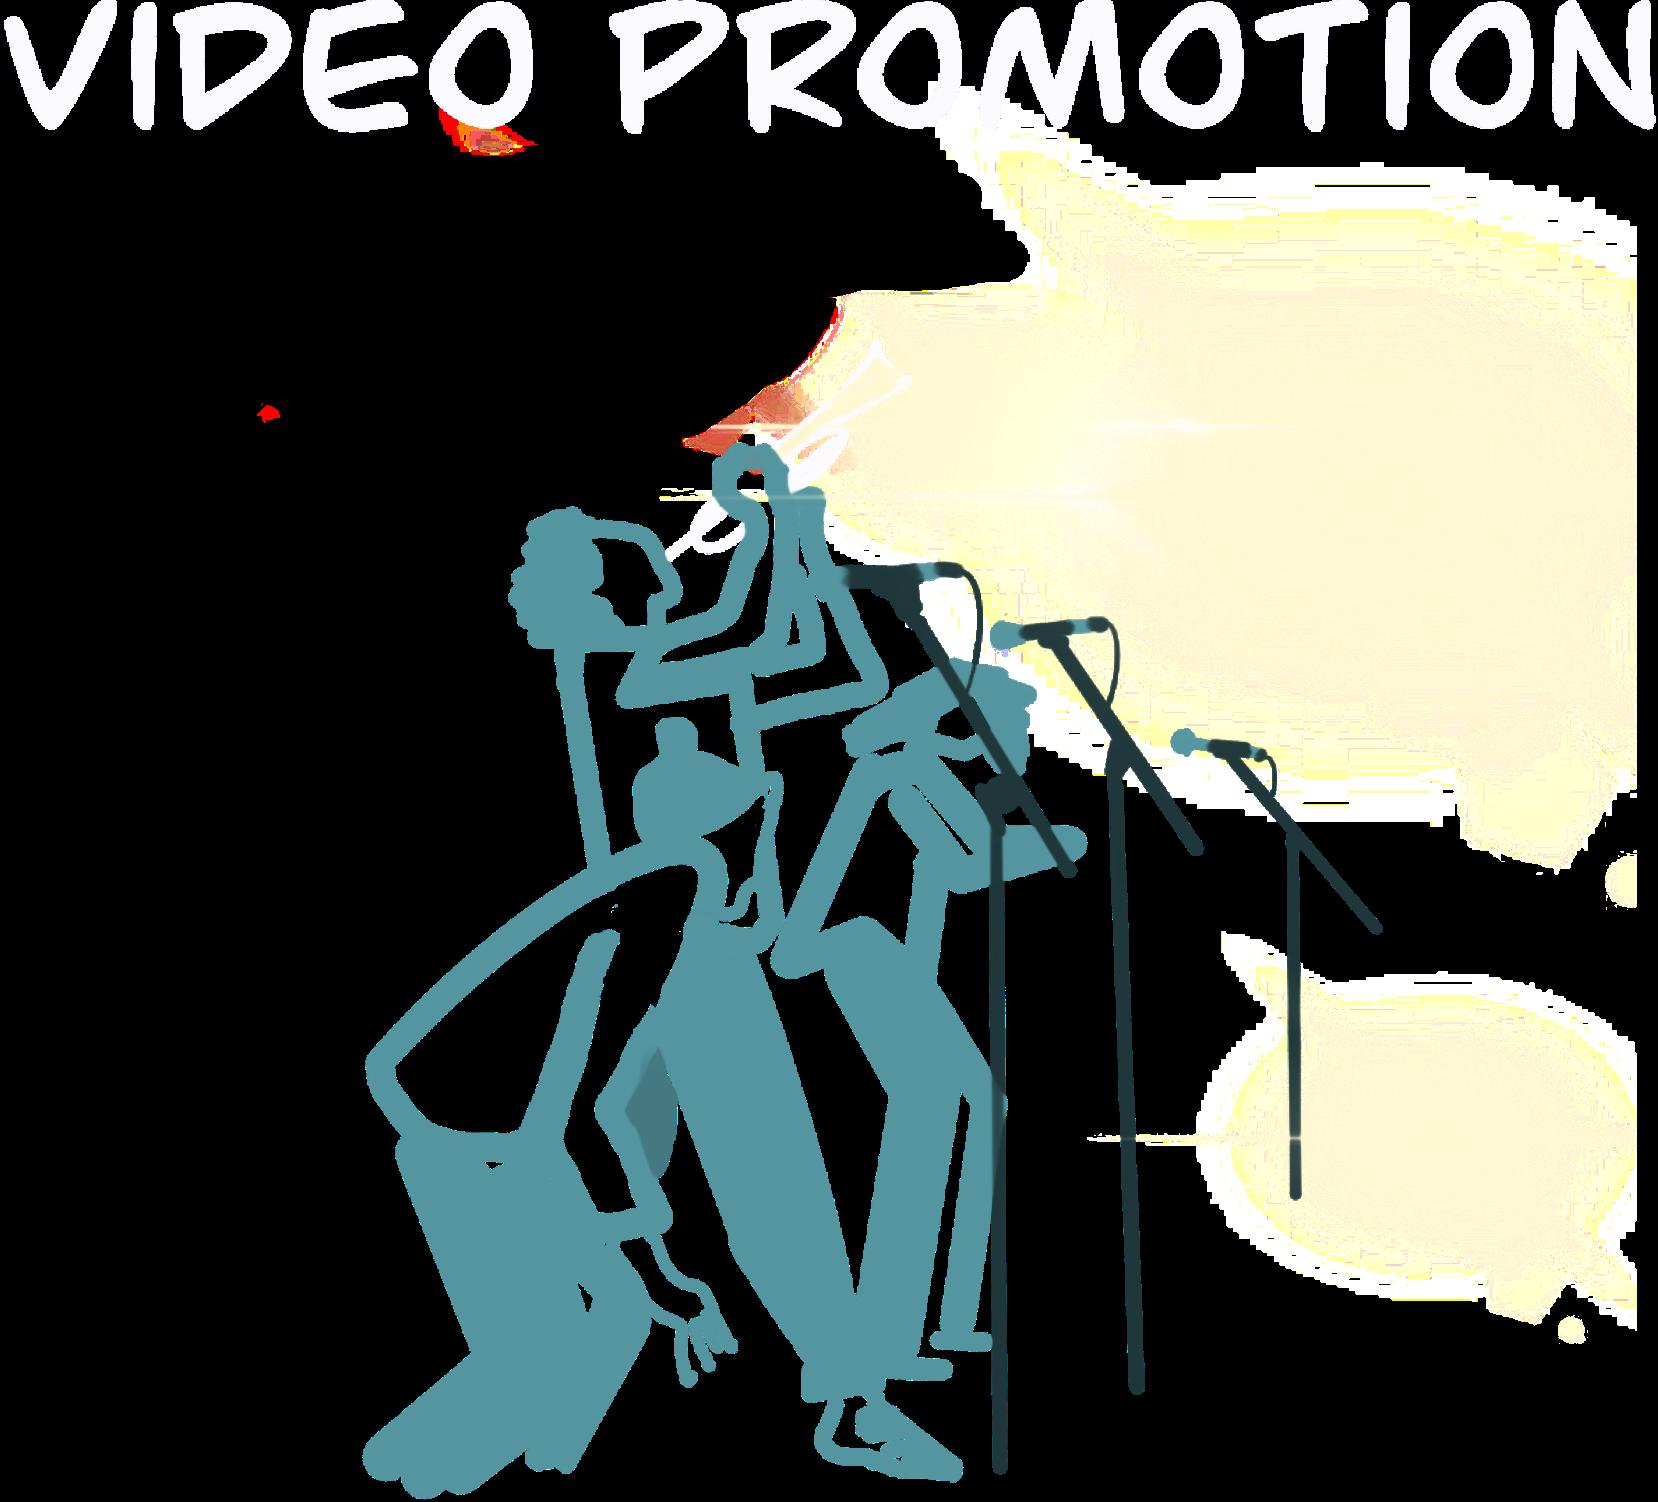 Concert video promotion